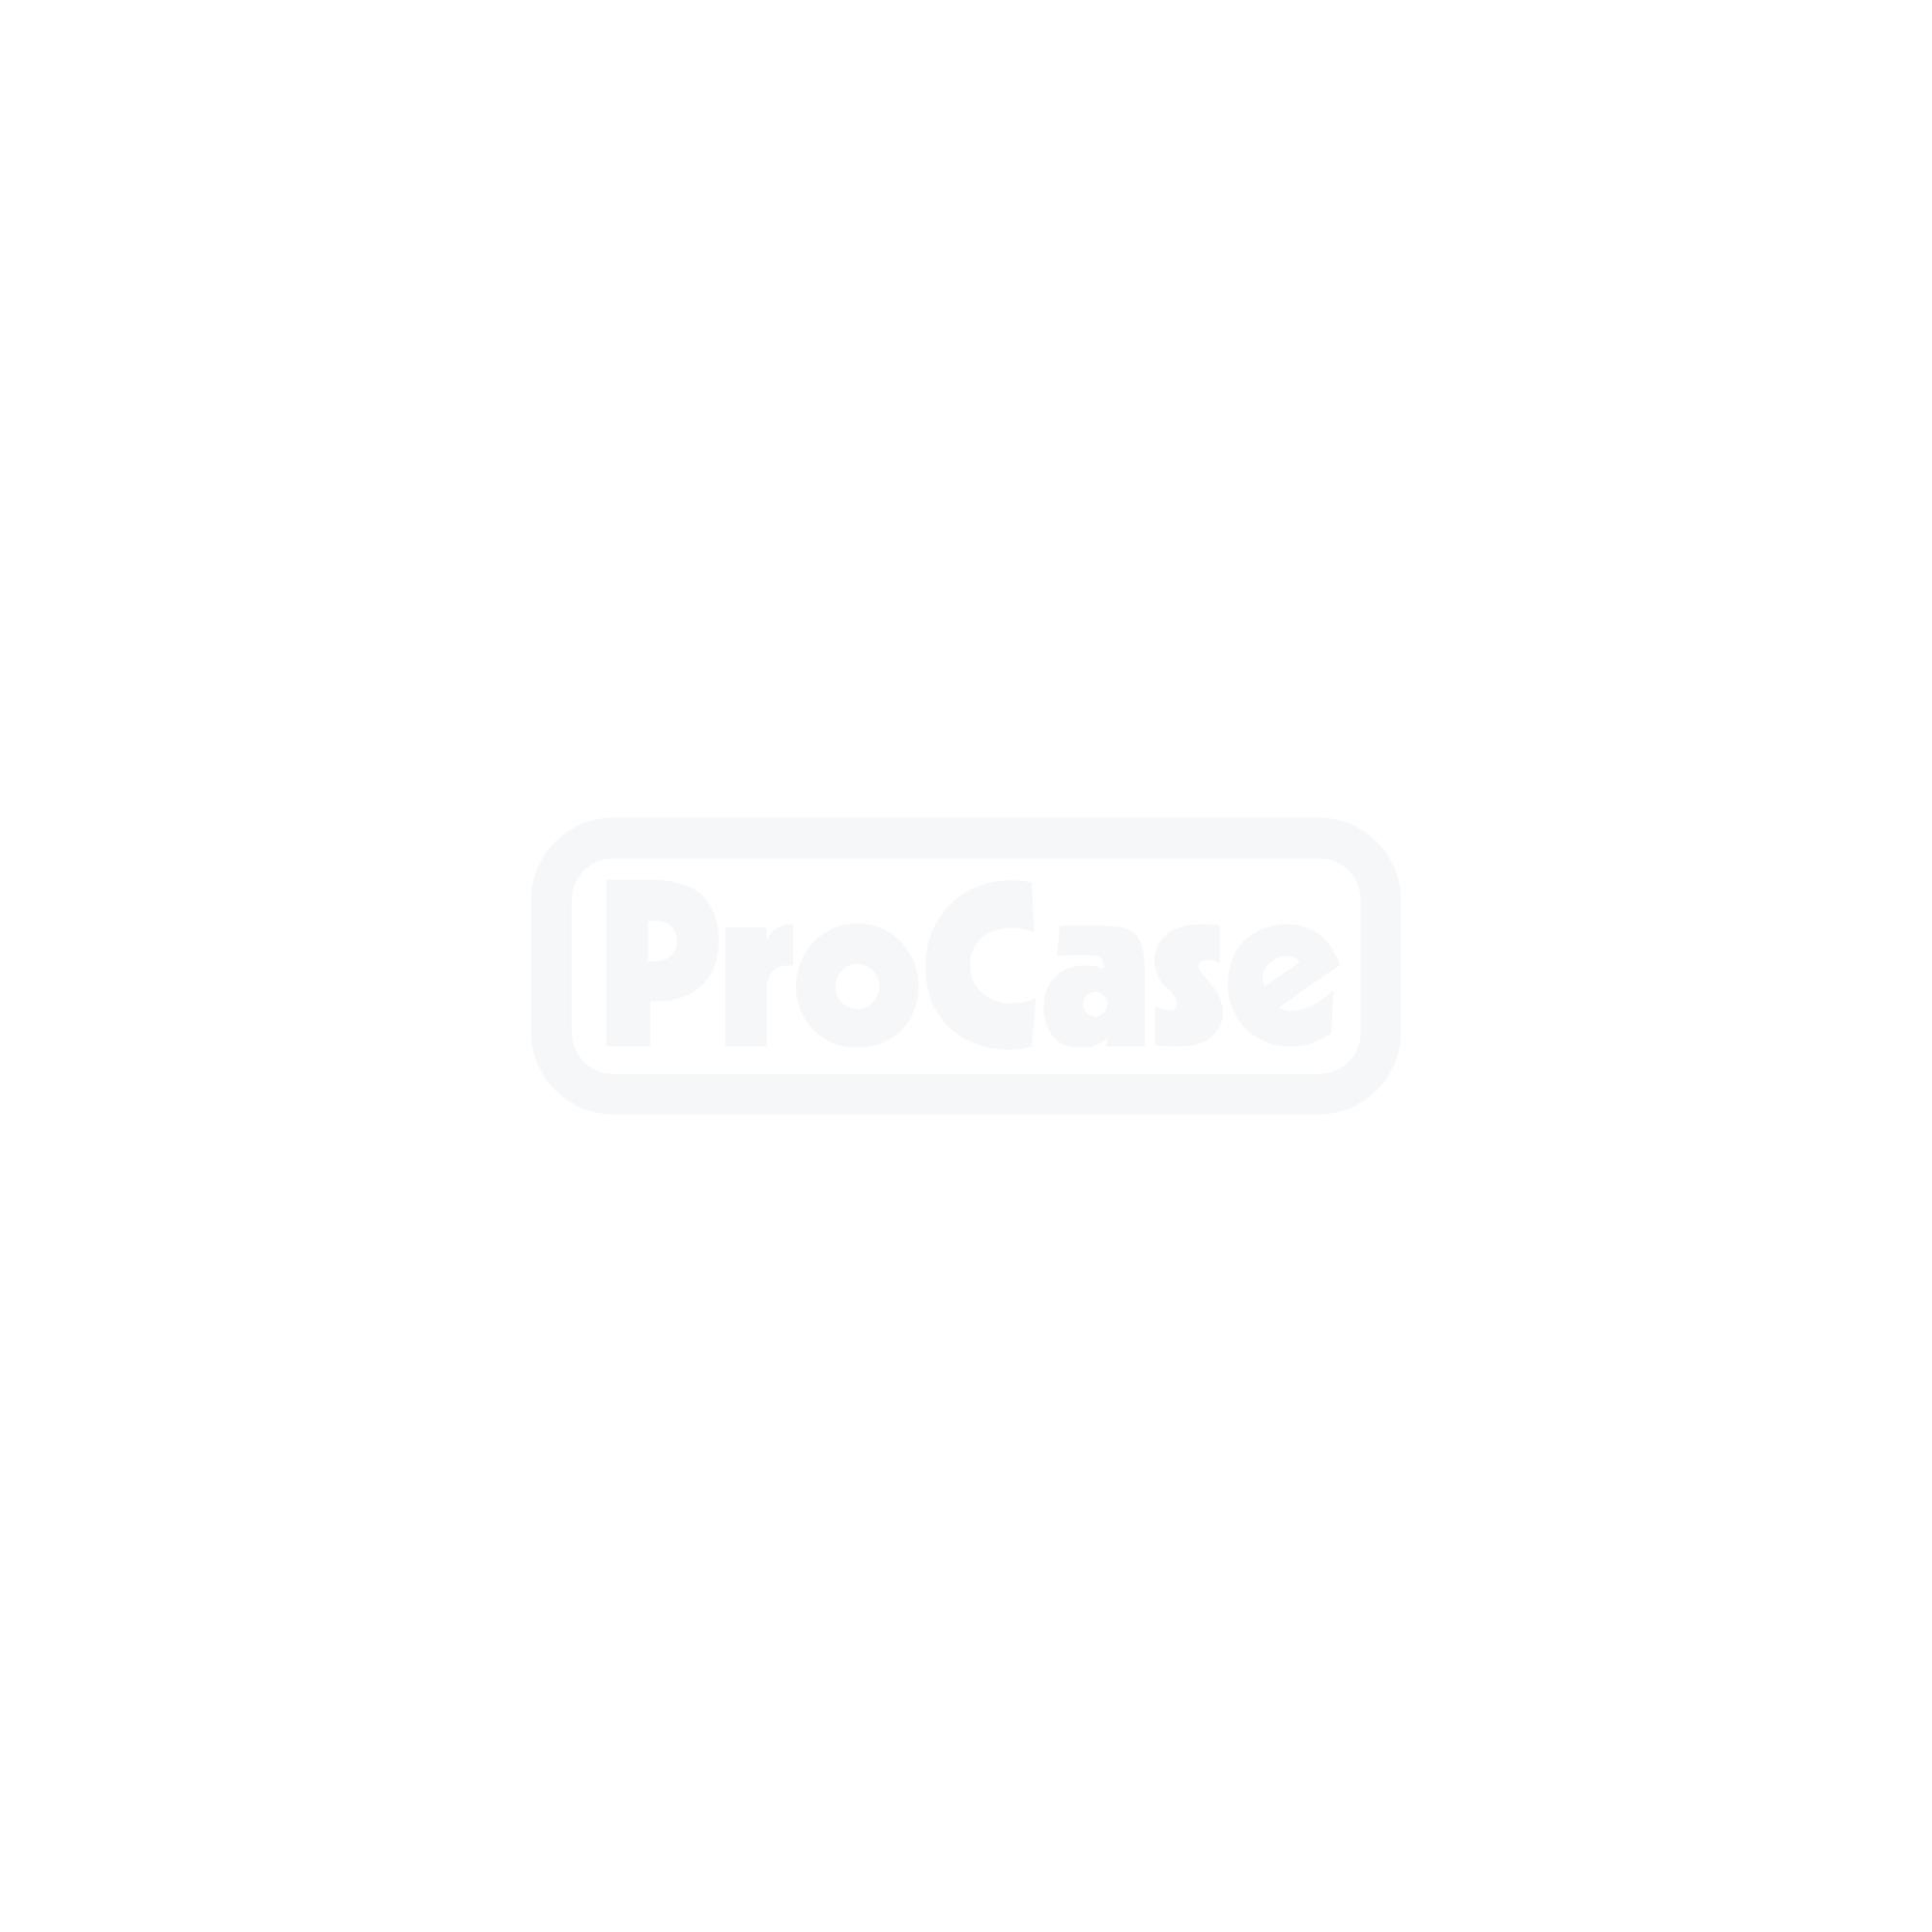 Stapelbox STB5-36 Sperrholzkiste 2